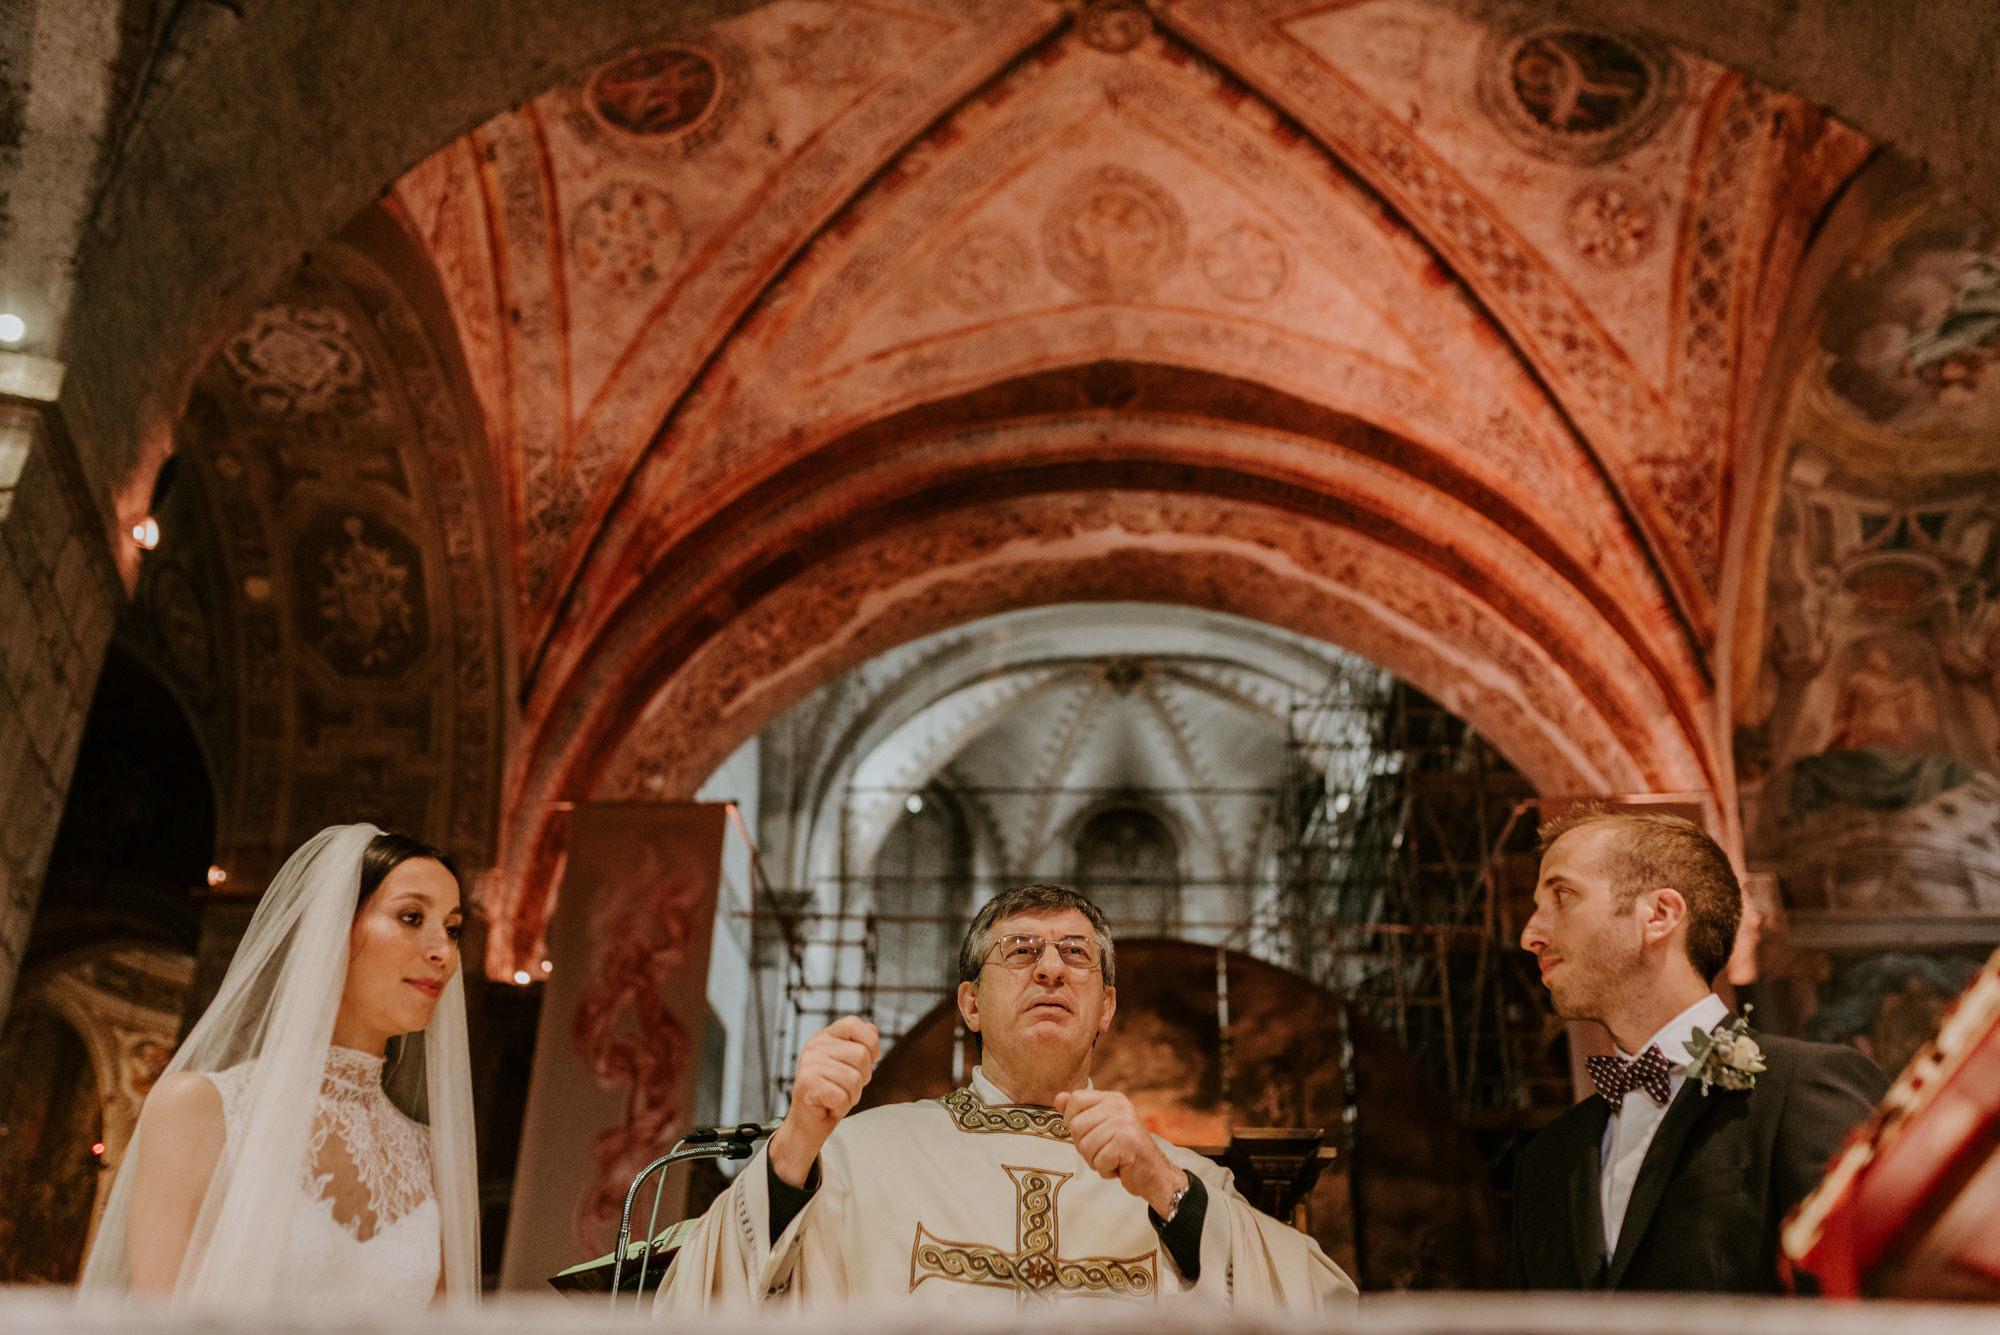 FOTO+PHOTO+BODA+WEDDING+ITALIA+ITALY+MAURICIO+GARAY+MAURICIOGARAY+WEDDINPHOTOGRAPHER+FOTOGRAFODEBODA-942.jpg